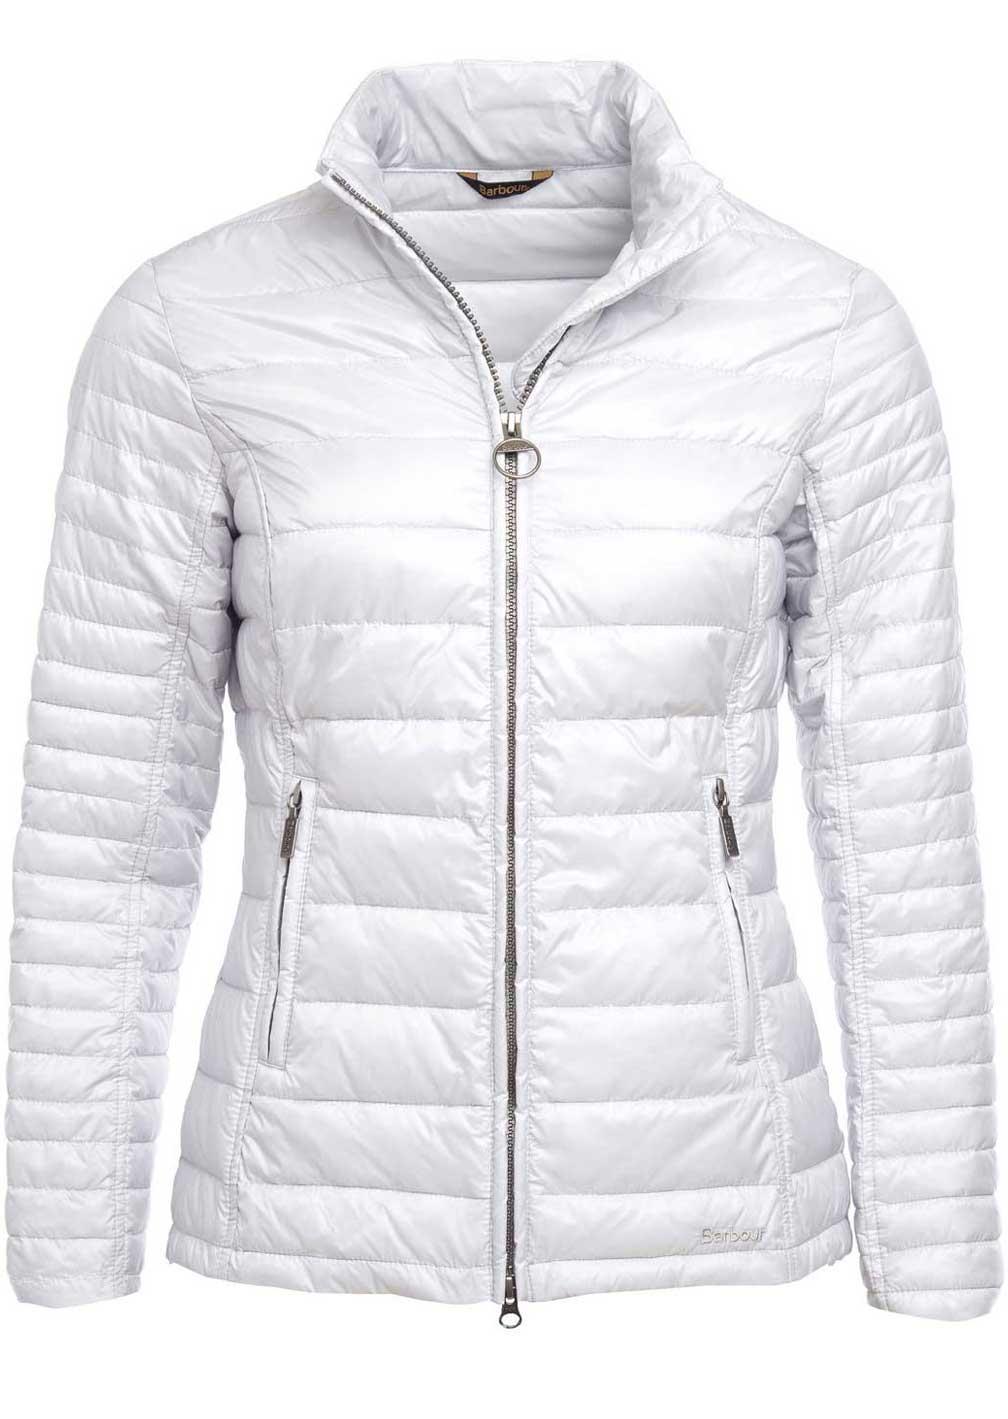 Barbour - Women's Trevose Waterproof Jacket